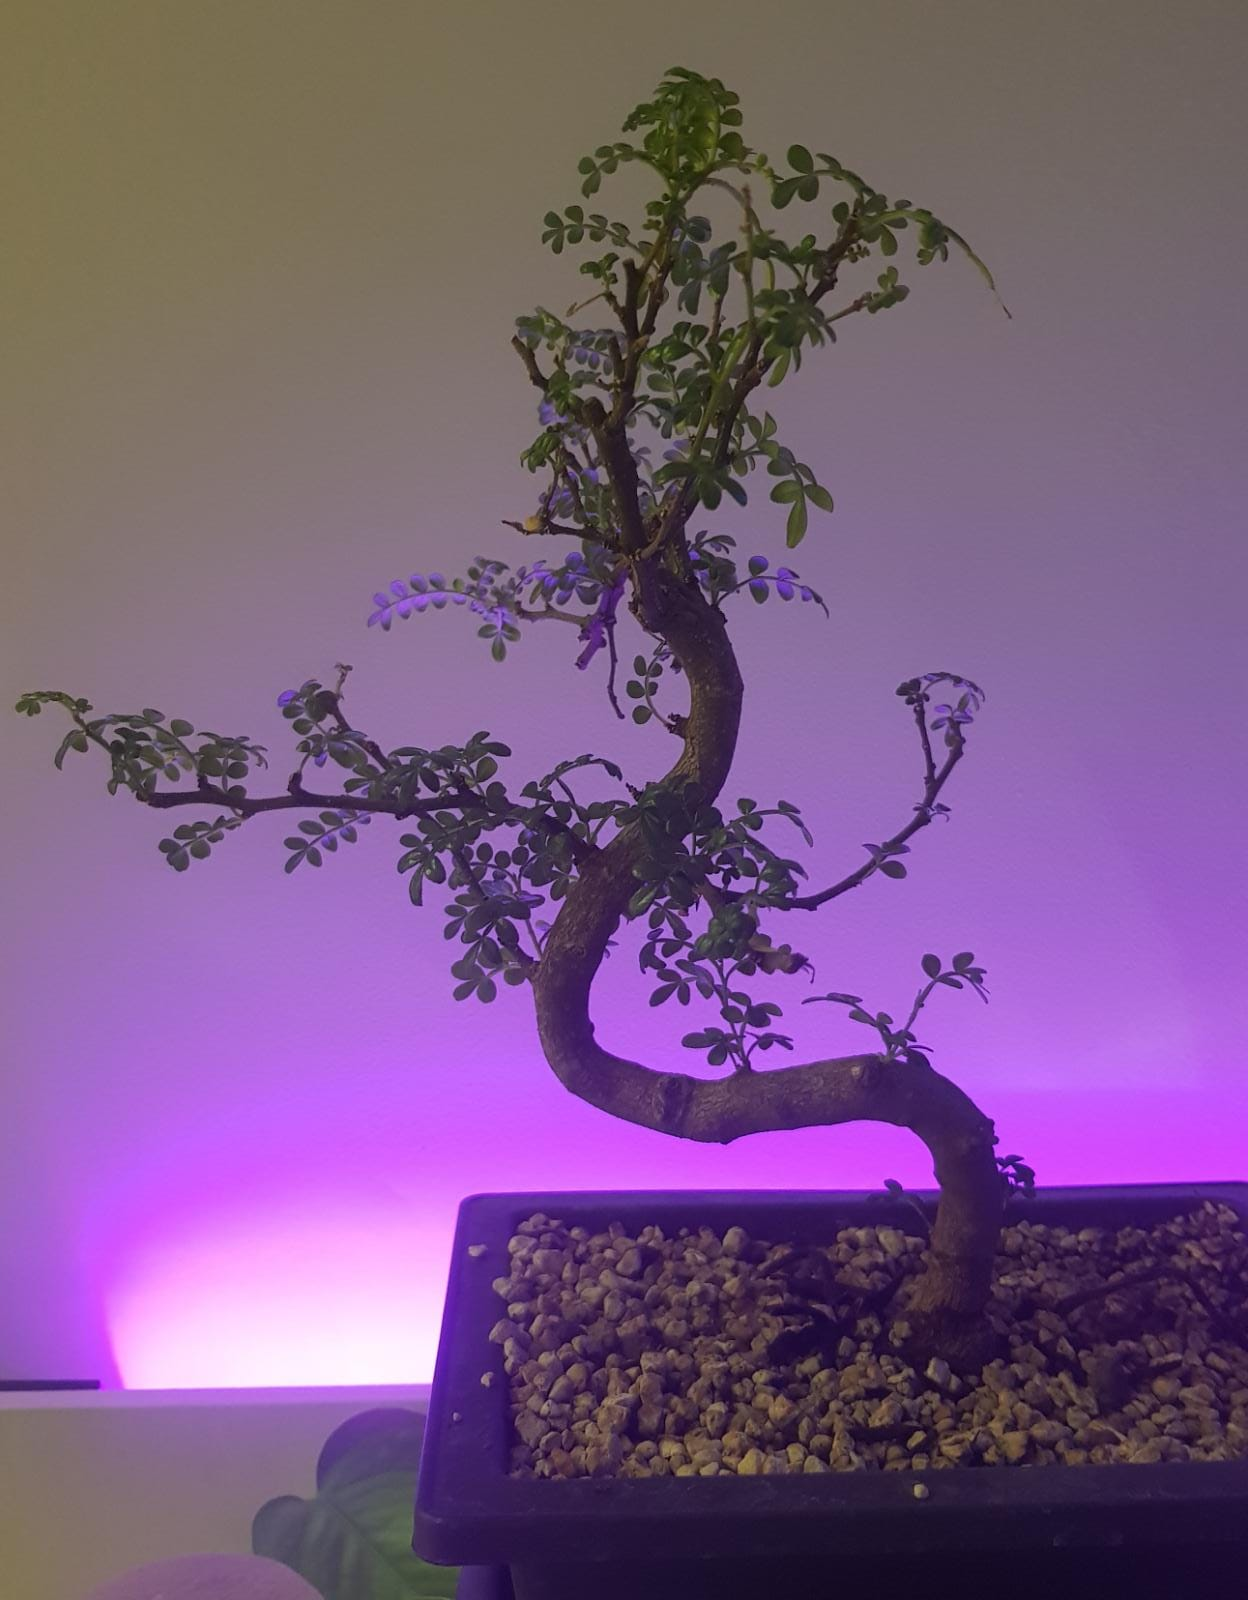 primo bonsai pepper tree: chiedo consigli - Pagina 3 Bonsai01